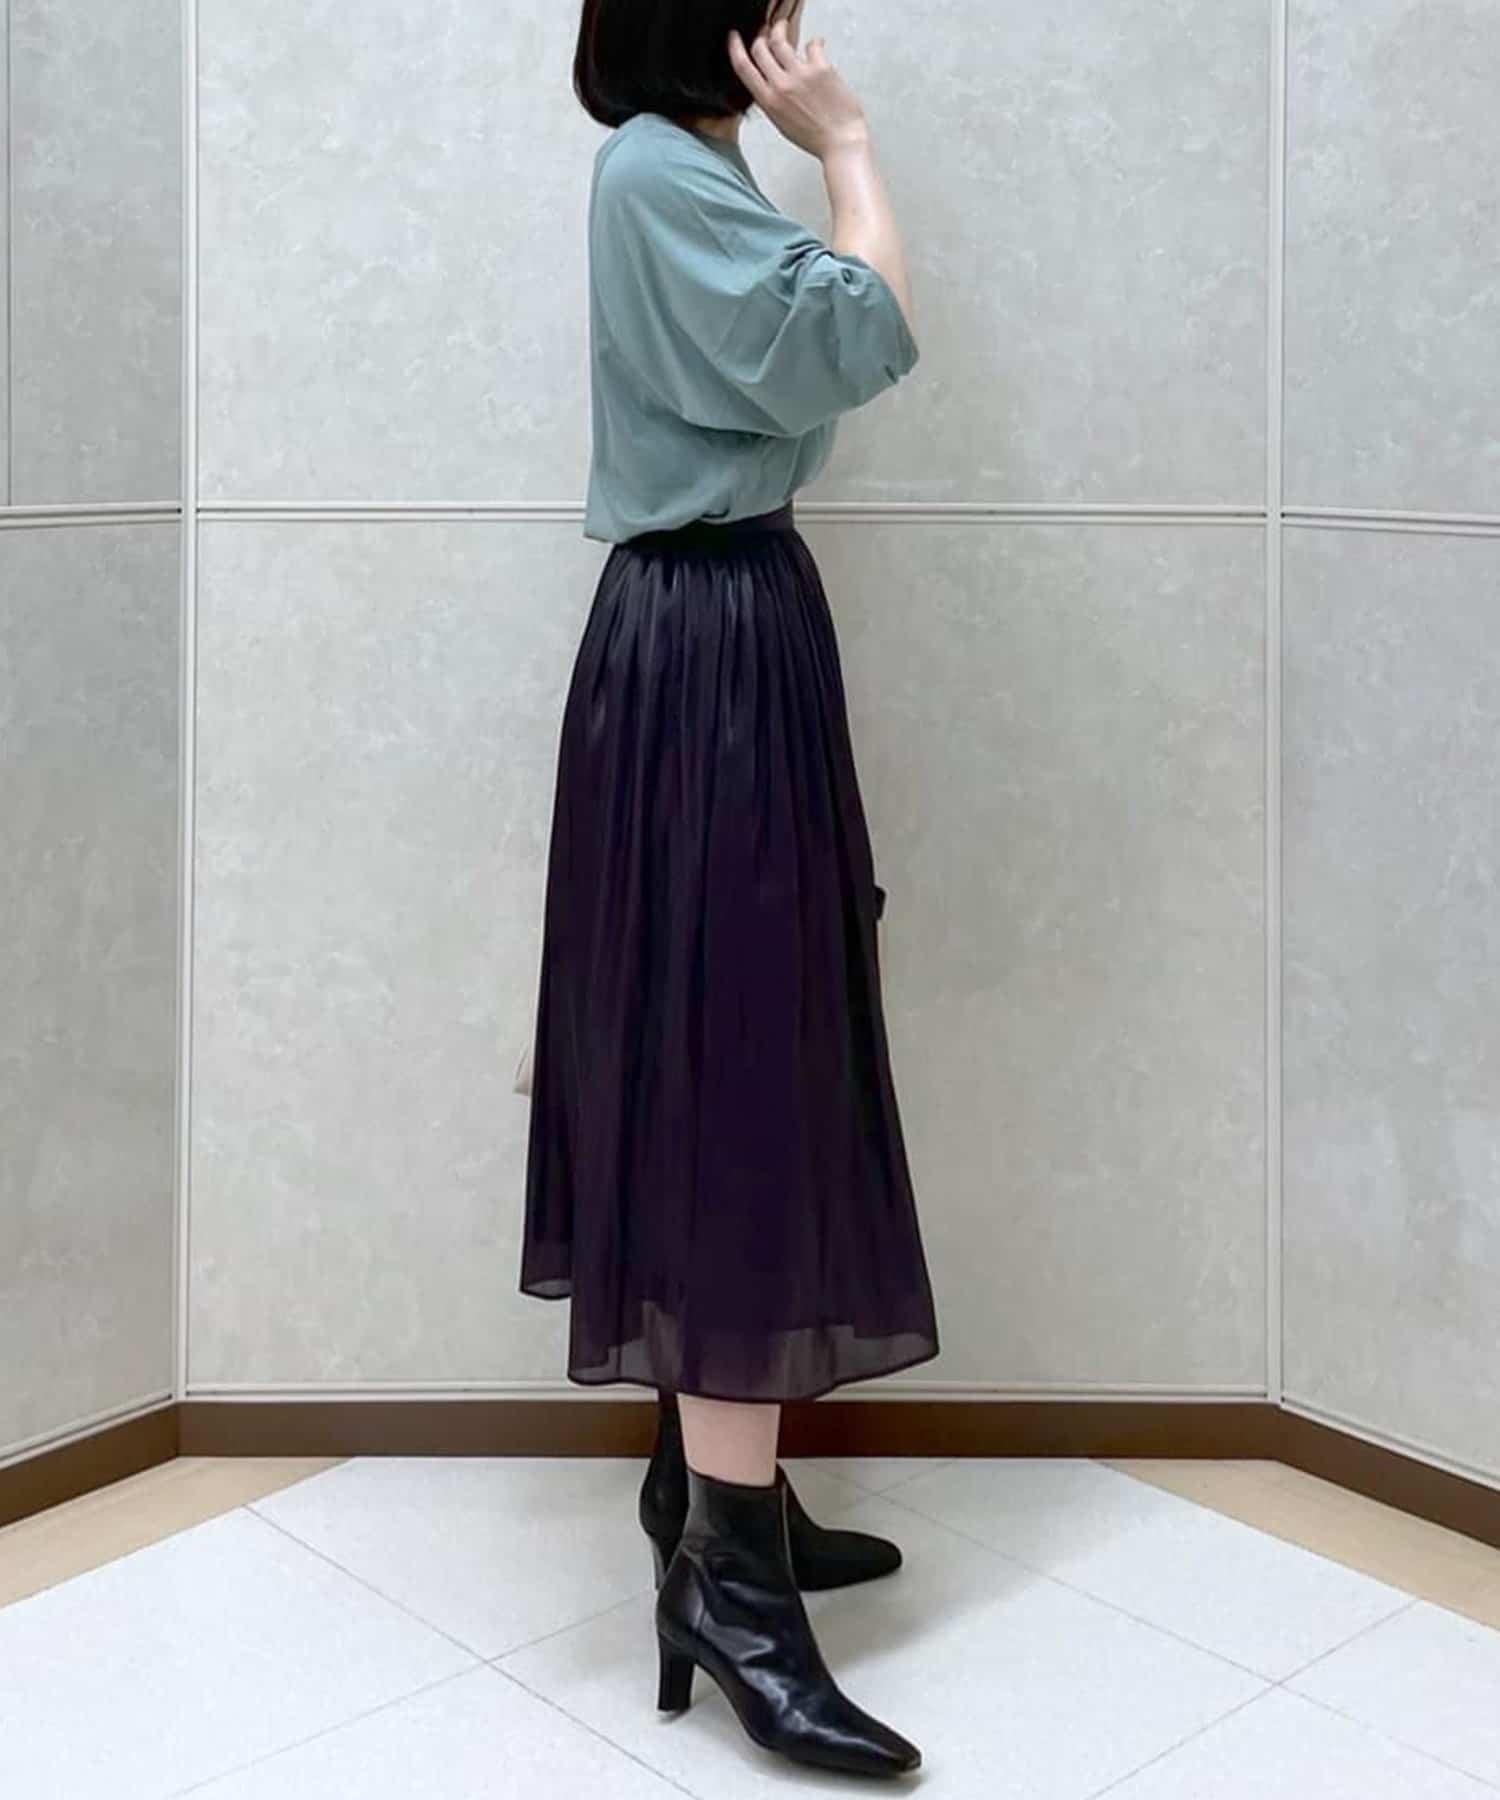 OUTLET premium(アウトレット プレミアム) 【オーバーサイズがラフな雰囲気に】ハイゲージコットンロンTシャツ